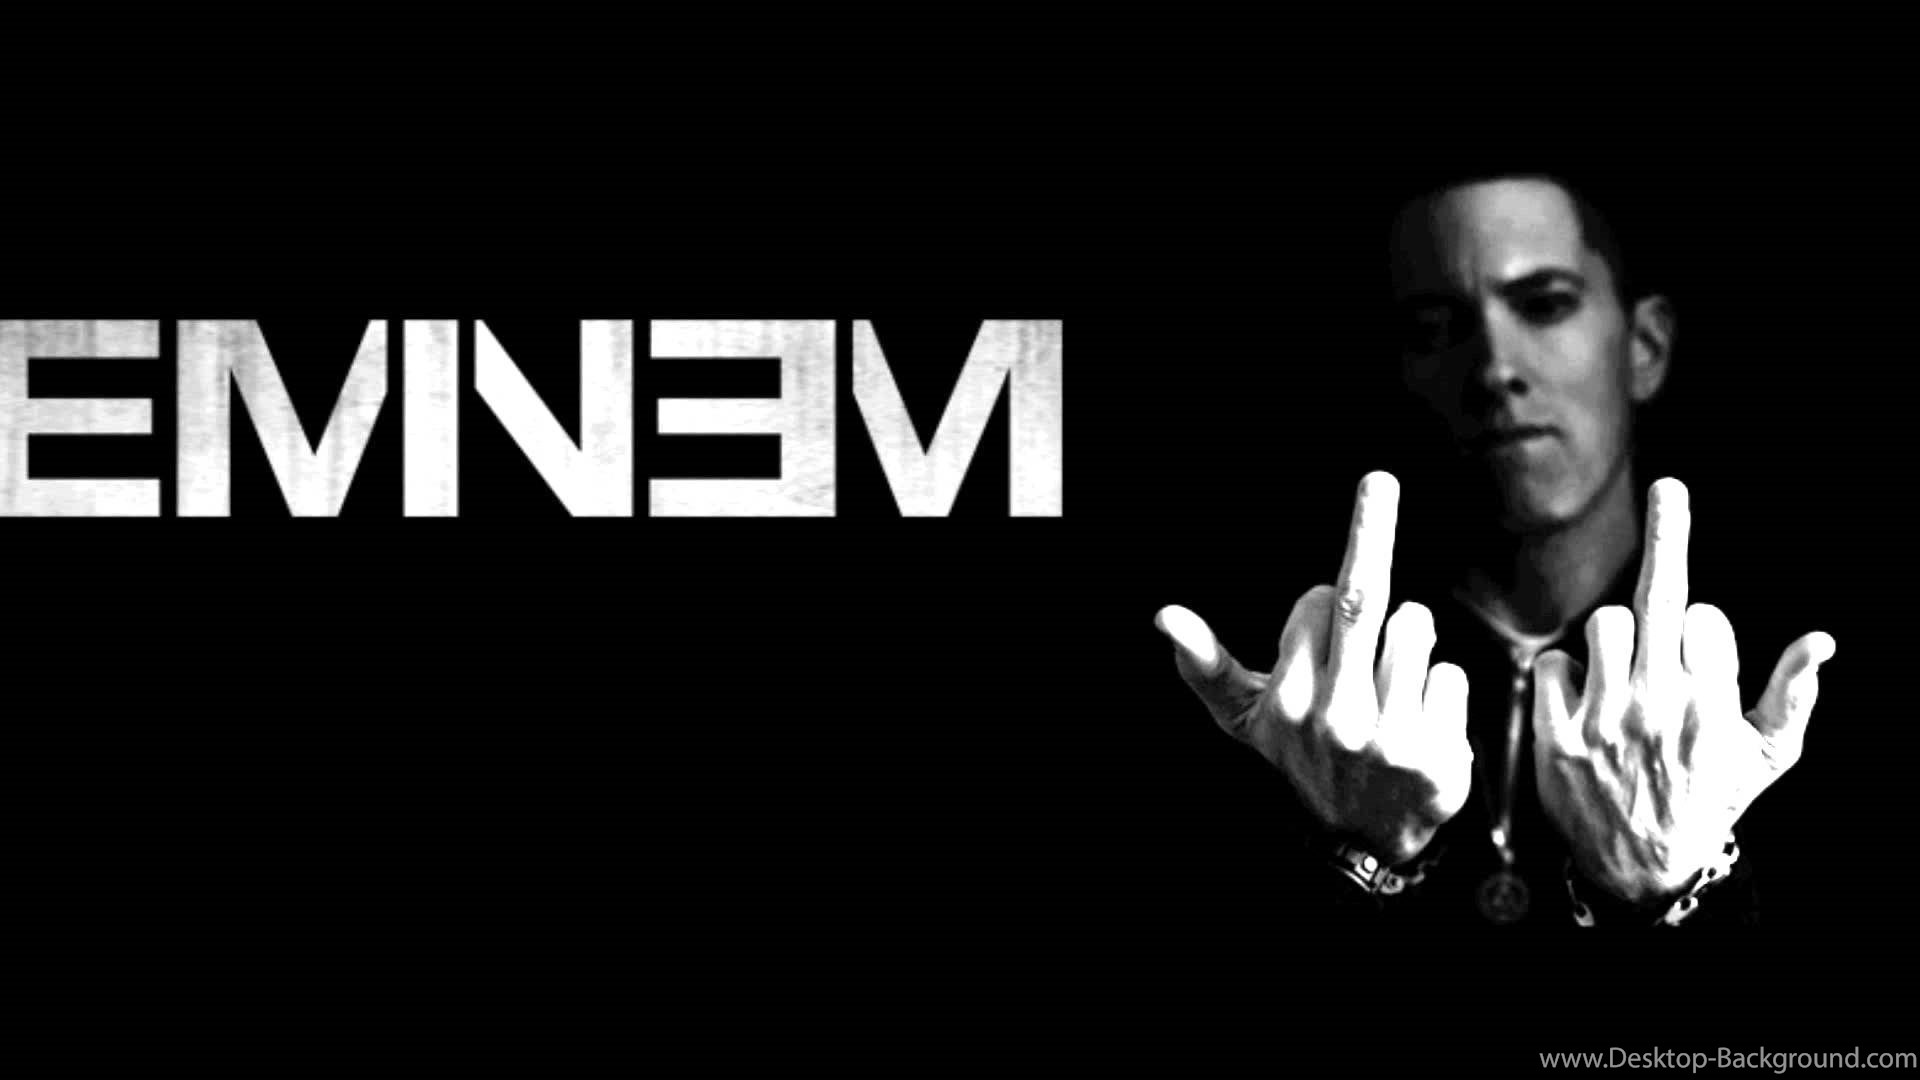 Popular Eminem Wallpapers For Pc 136590 Hd Wallpaper